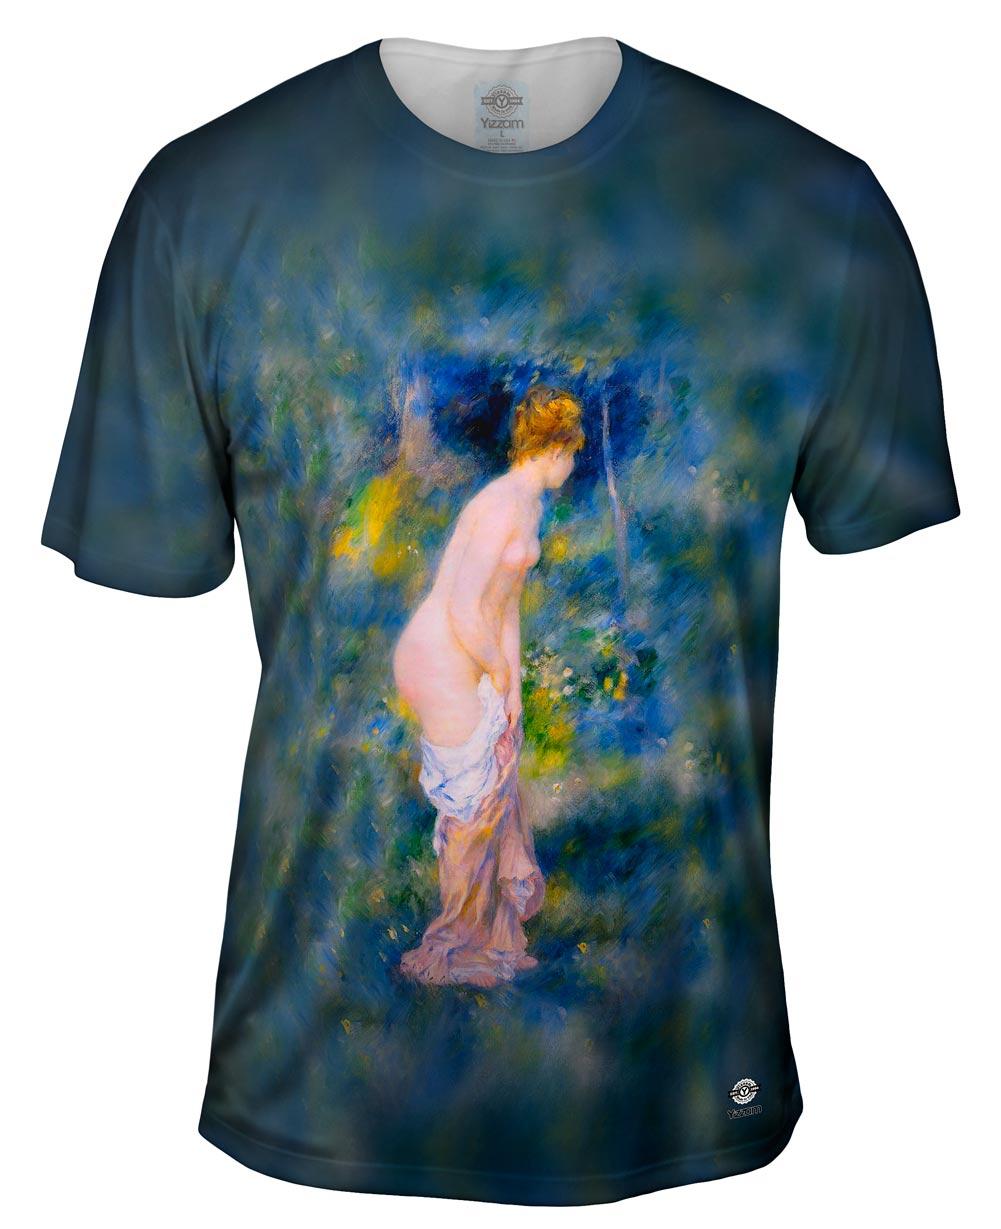 "Auguste Renoir - ""The Standing Bather"" (1887)"